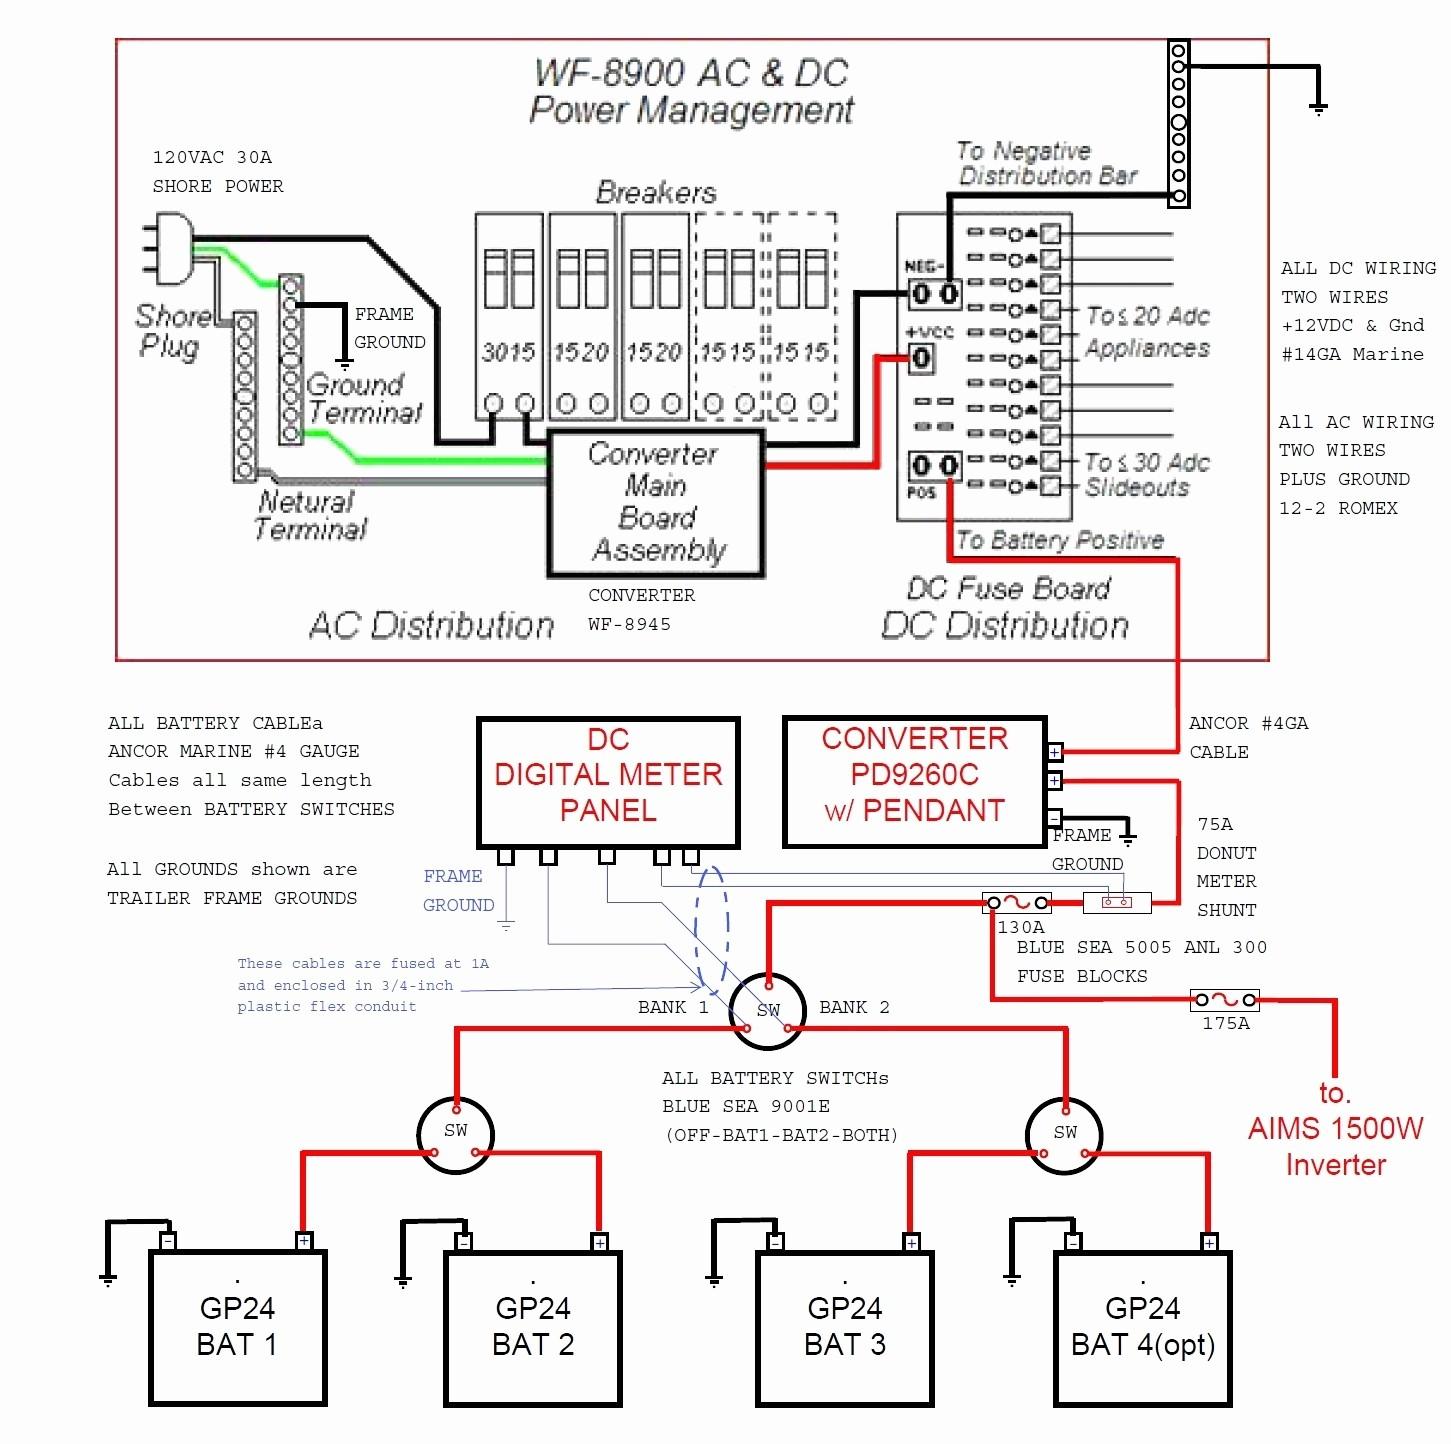 travel trailer floor plans lovely eagle trailer wiring diagram best  electric trailer brake wiring diagrams travel